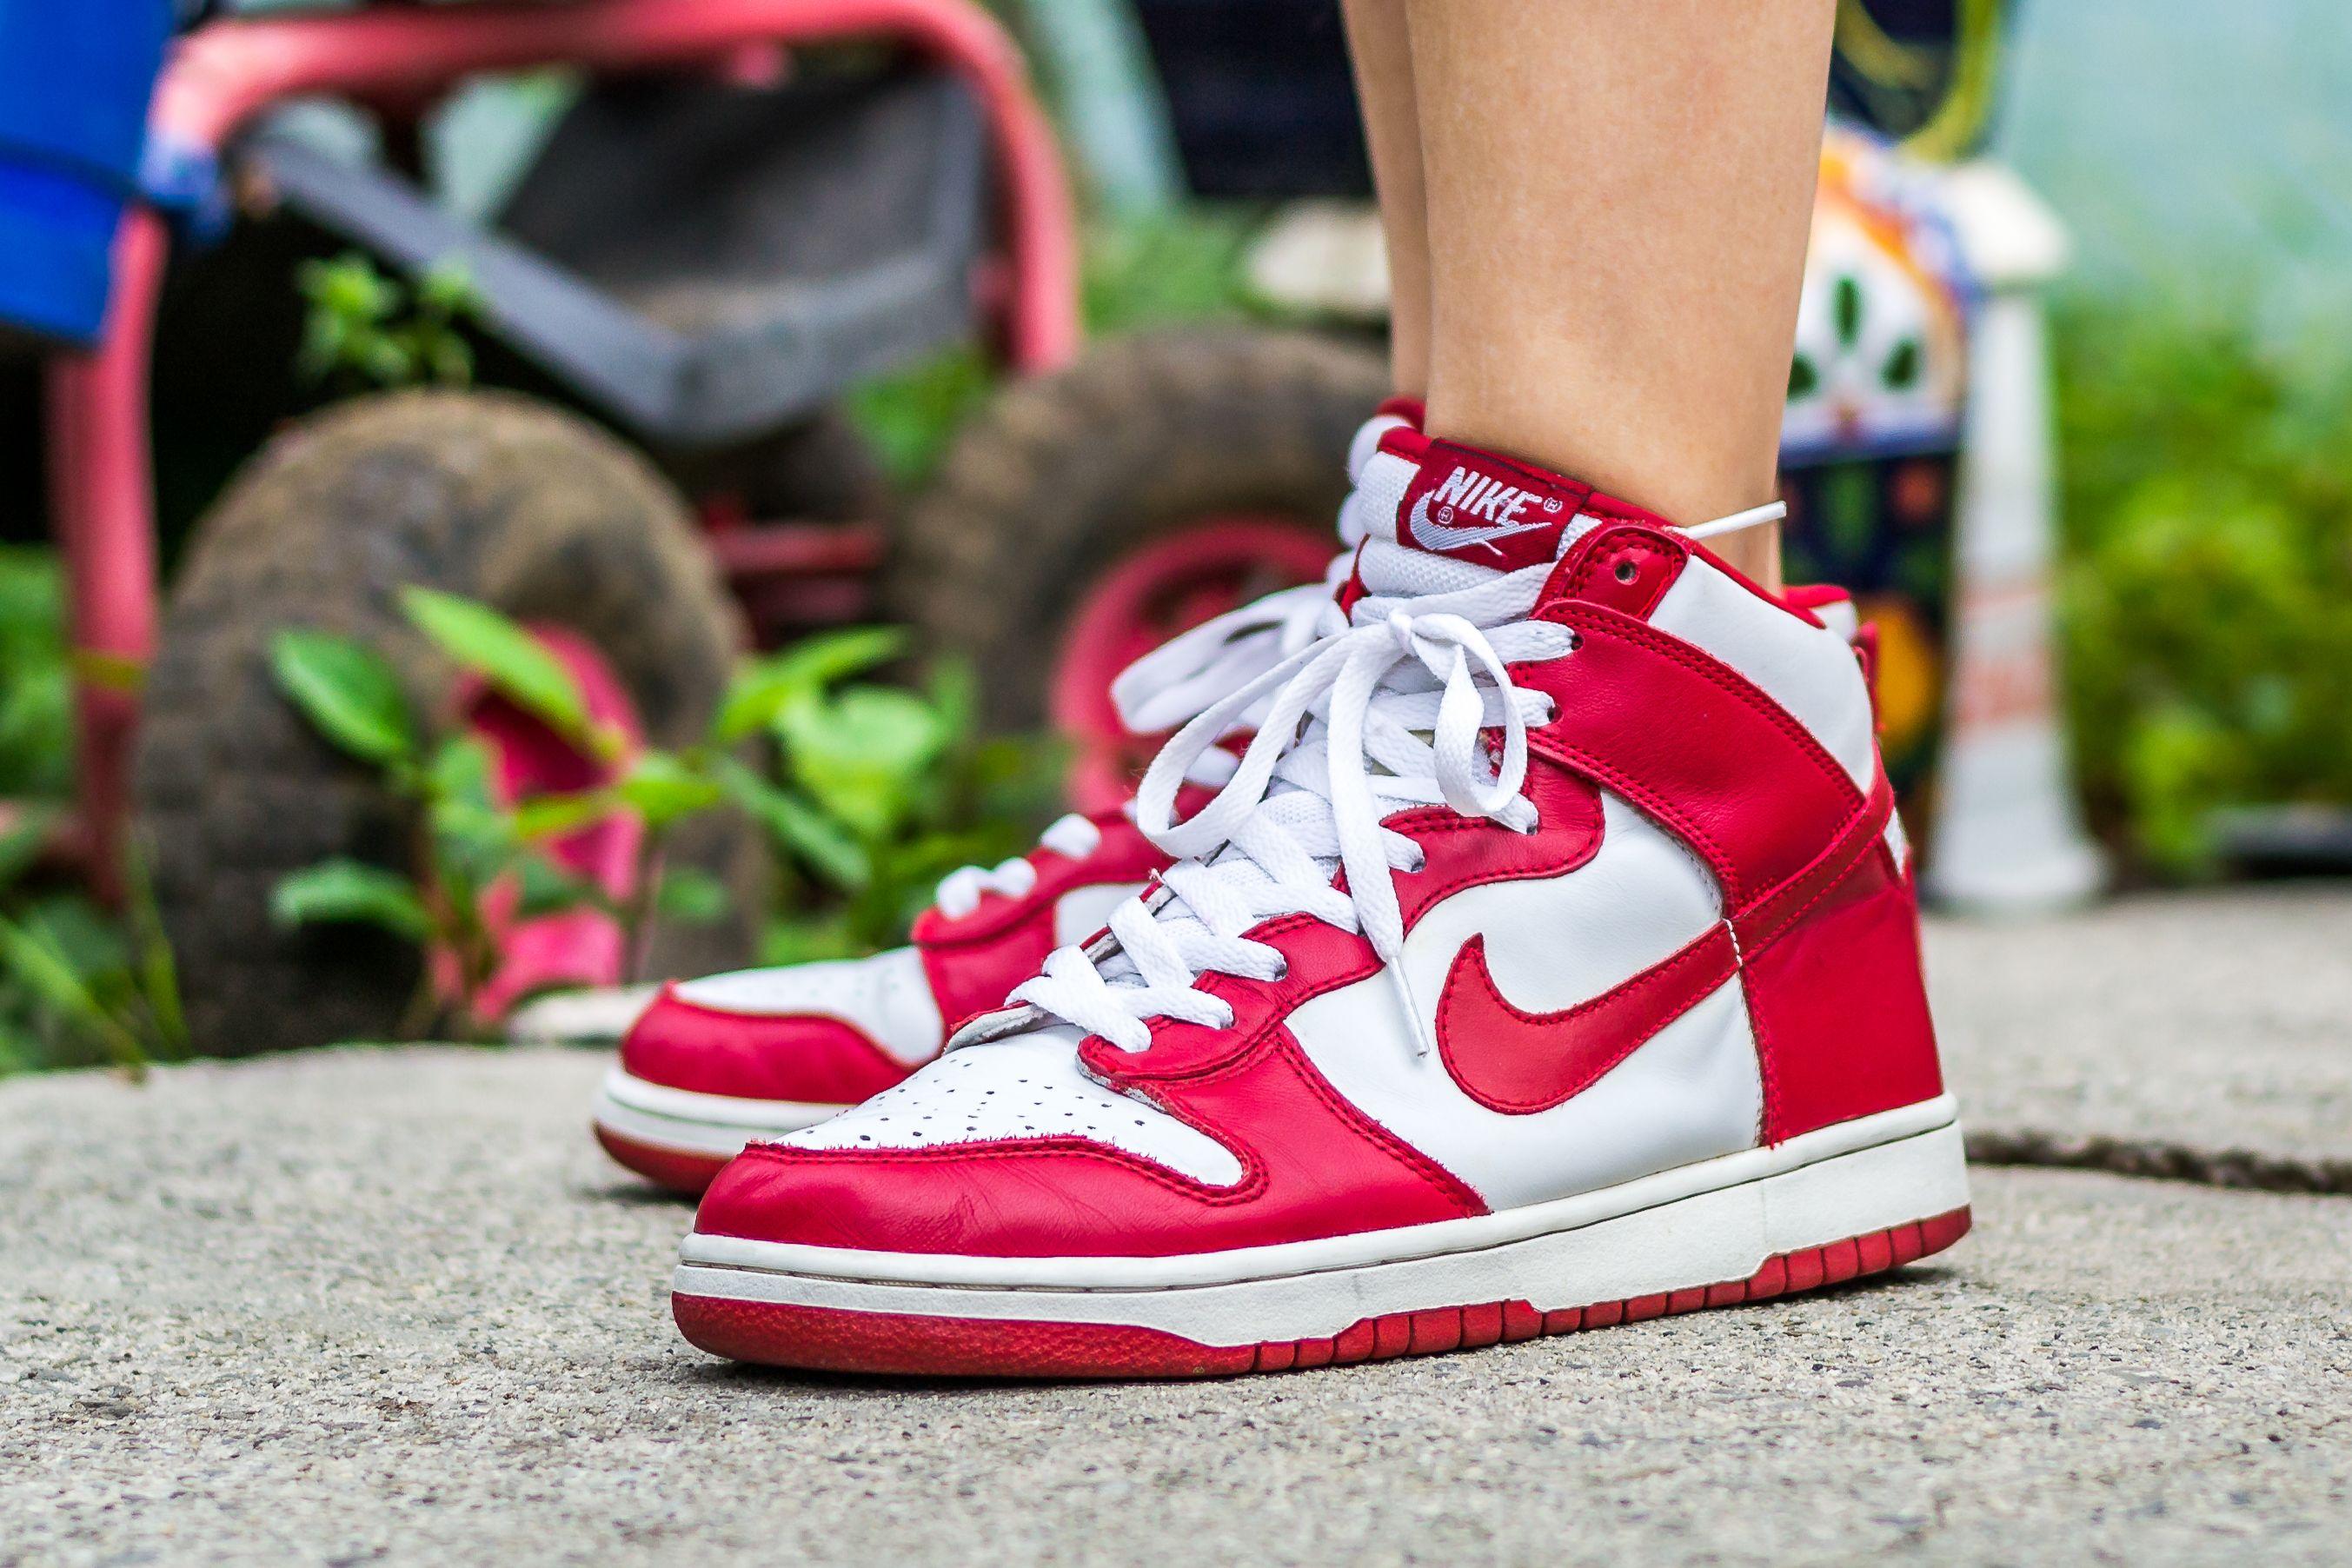 nike sb dunk high red